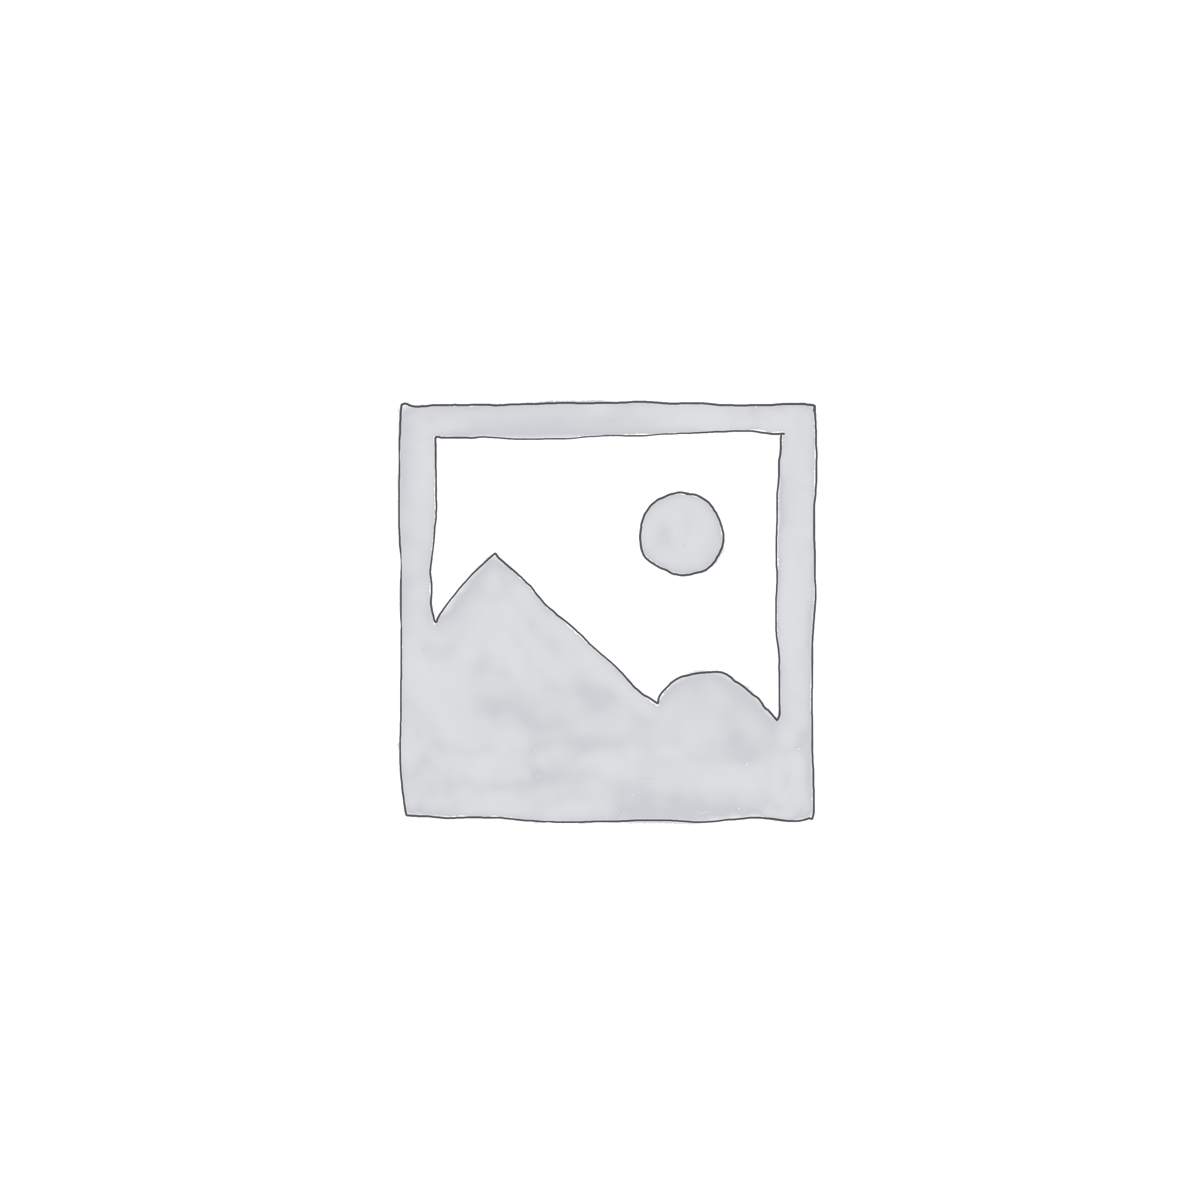 woocommerce placeholder - Pinterest Services